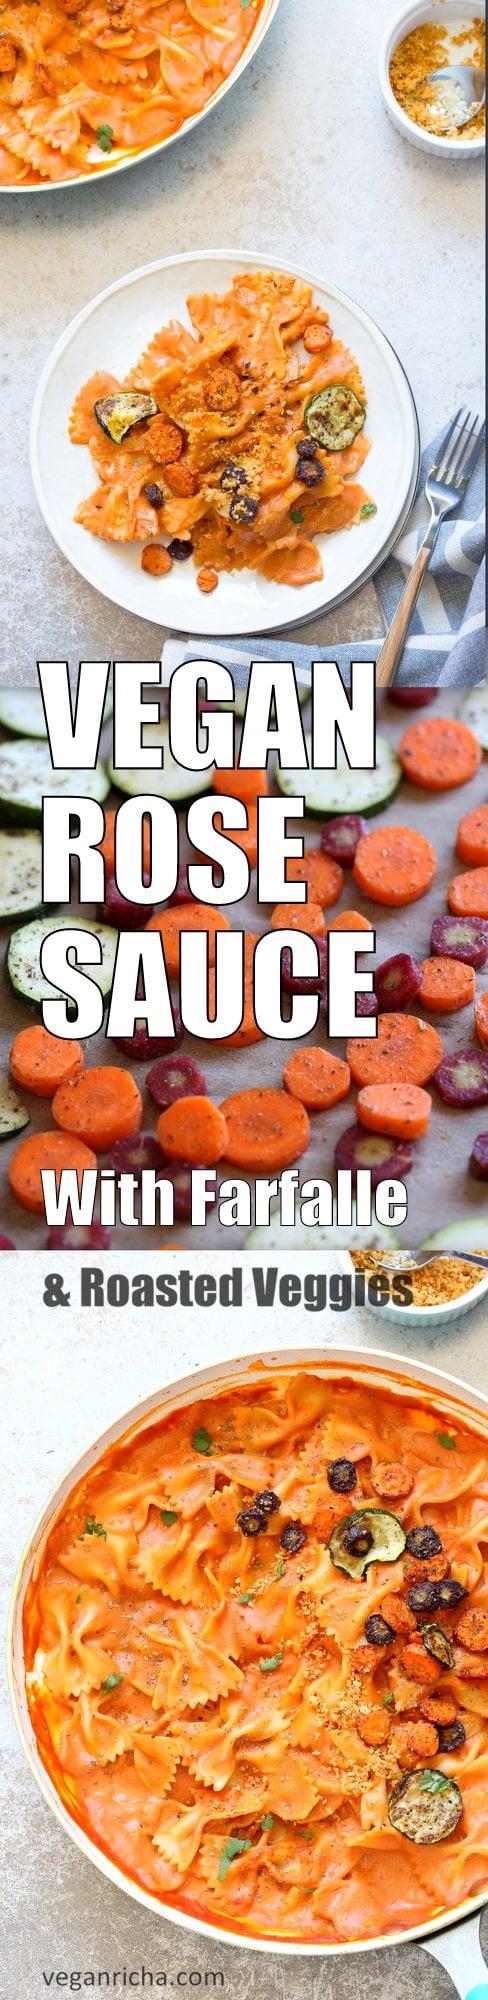 Vegan Rose Sauce Farfalle Pasta with Roasted Veggies. Easy Vegan Tomato Cream Sauce, serve with farfalle or other pasta, roasted veggies and vegan parm. #Vegan #veganricha #Soyfree #Recipe. Can be #glutenfree   VeganRicha.com